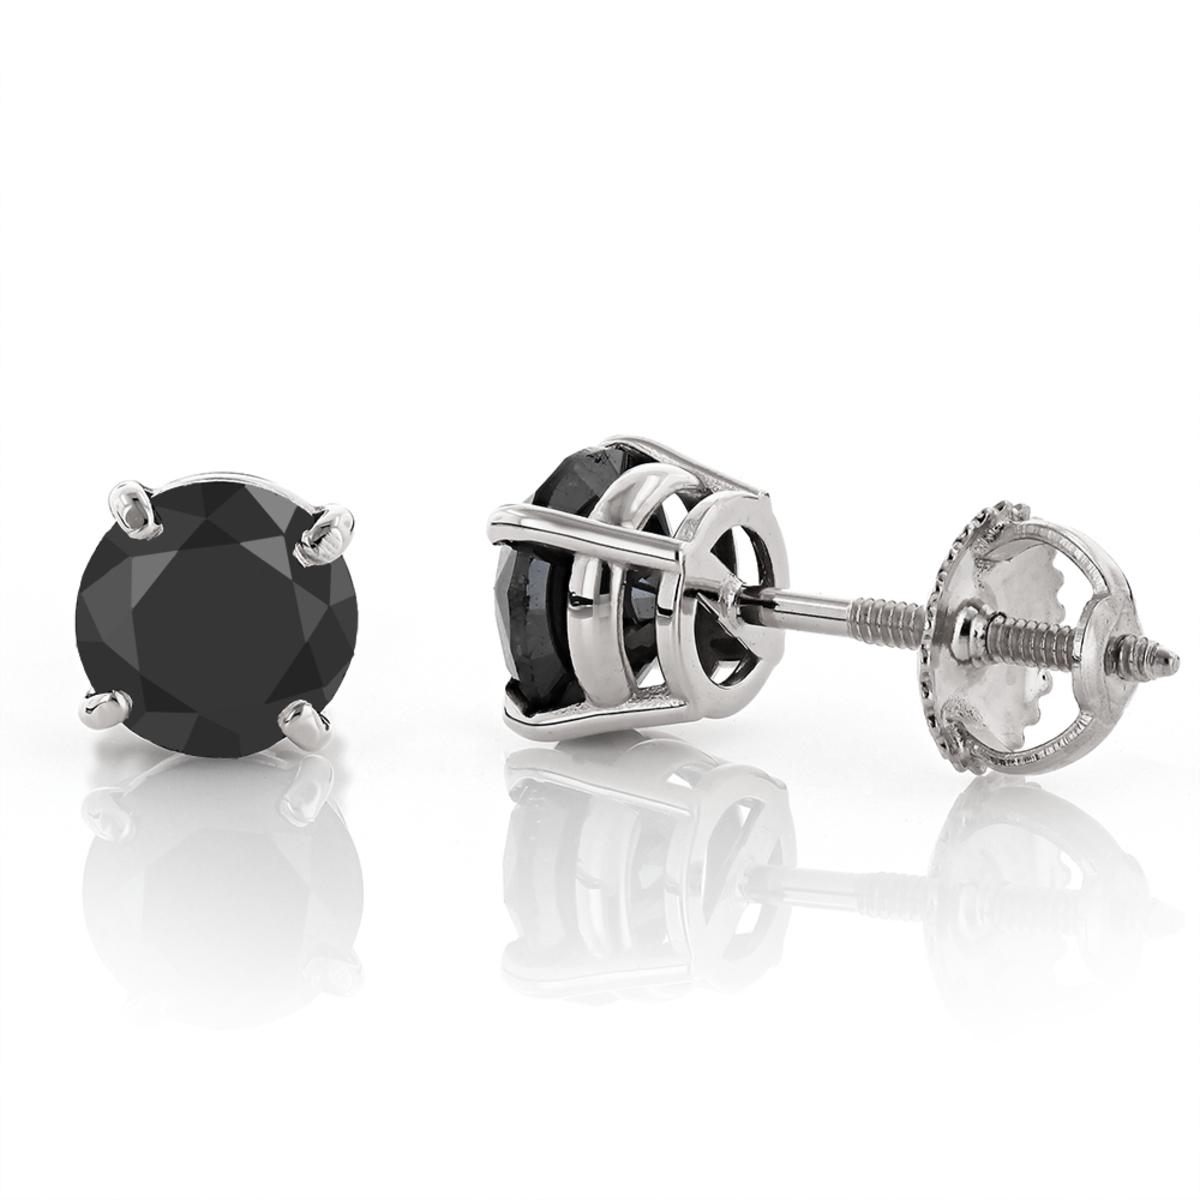 14K Gold Black Diamond Earrings Prong Set Studs 1.50ct